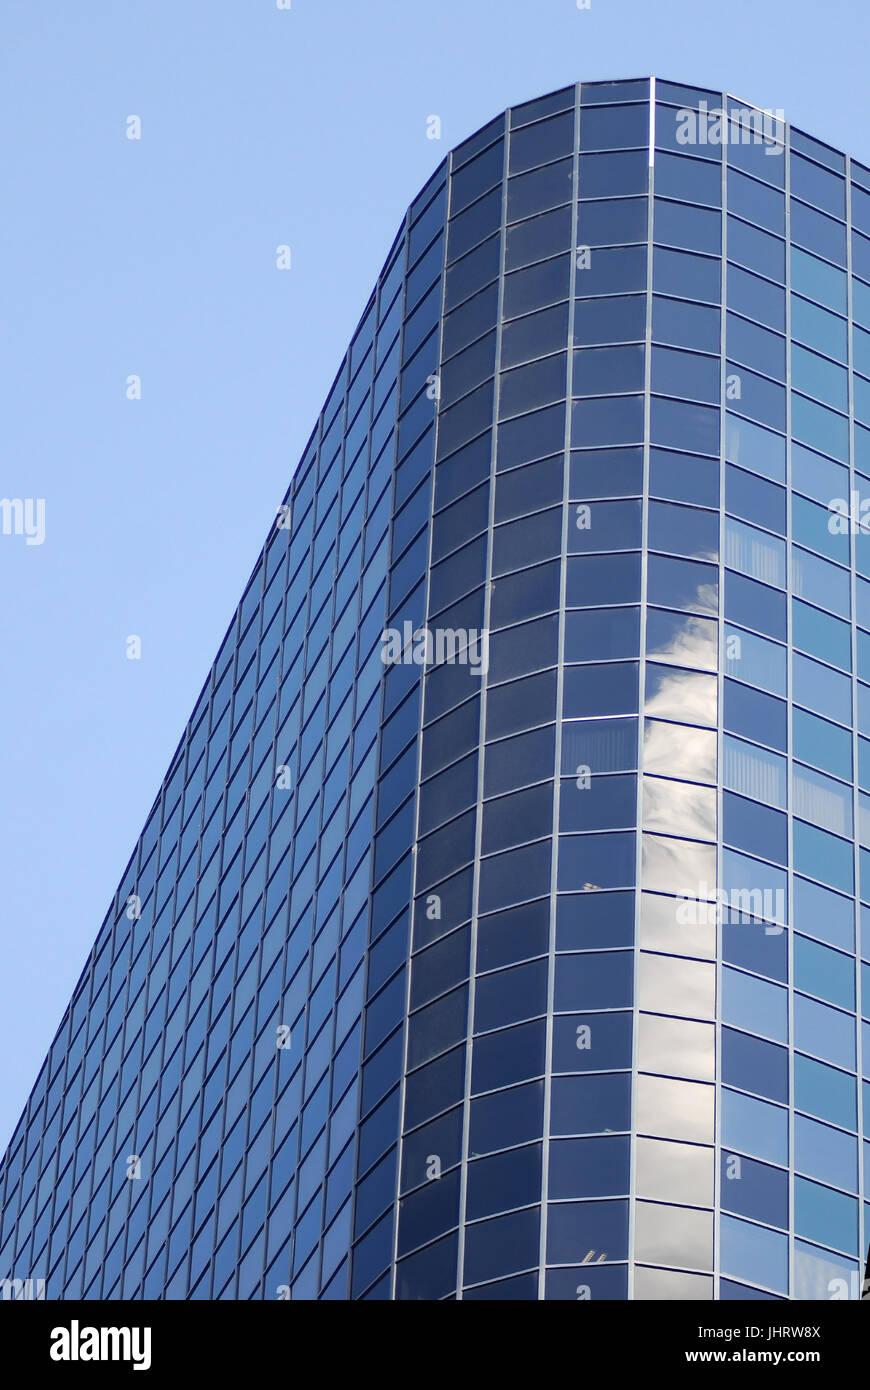 Skyscraper office building - high rise, Wolkenkratzer- Buerogebaeude - Hochhaus - Stock Image